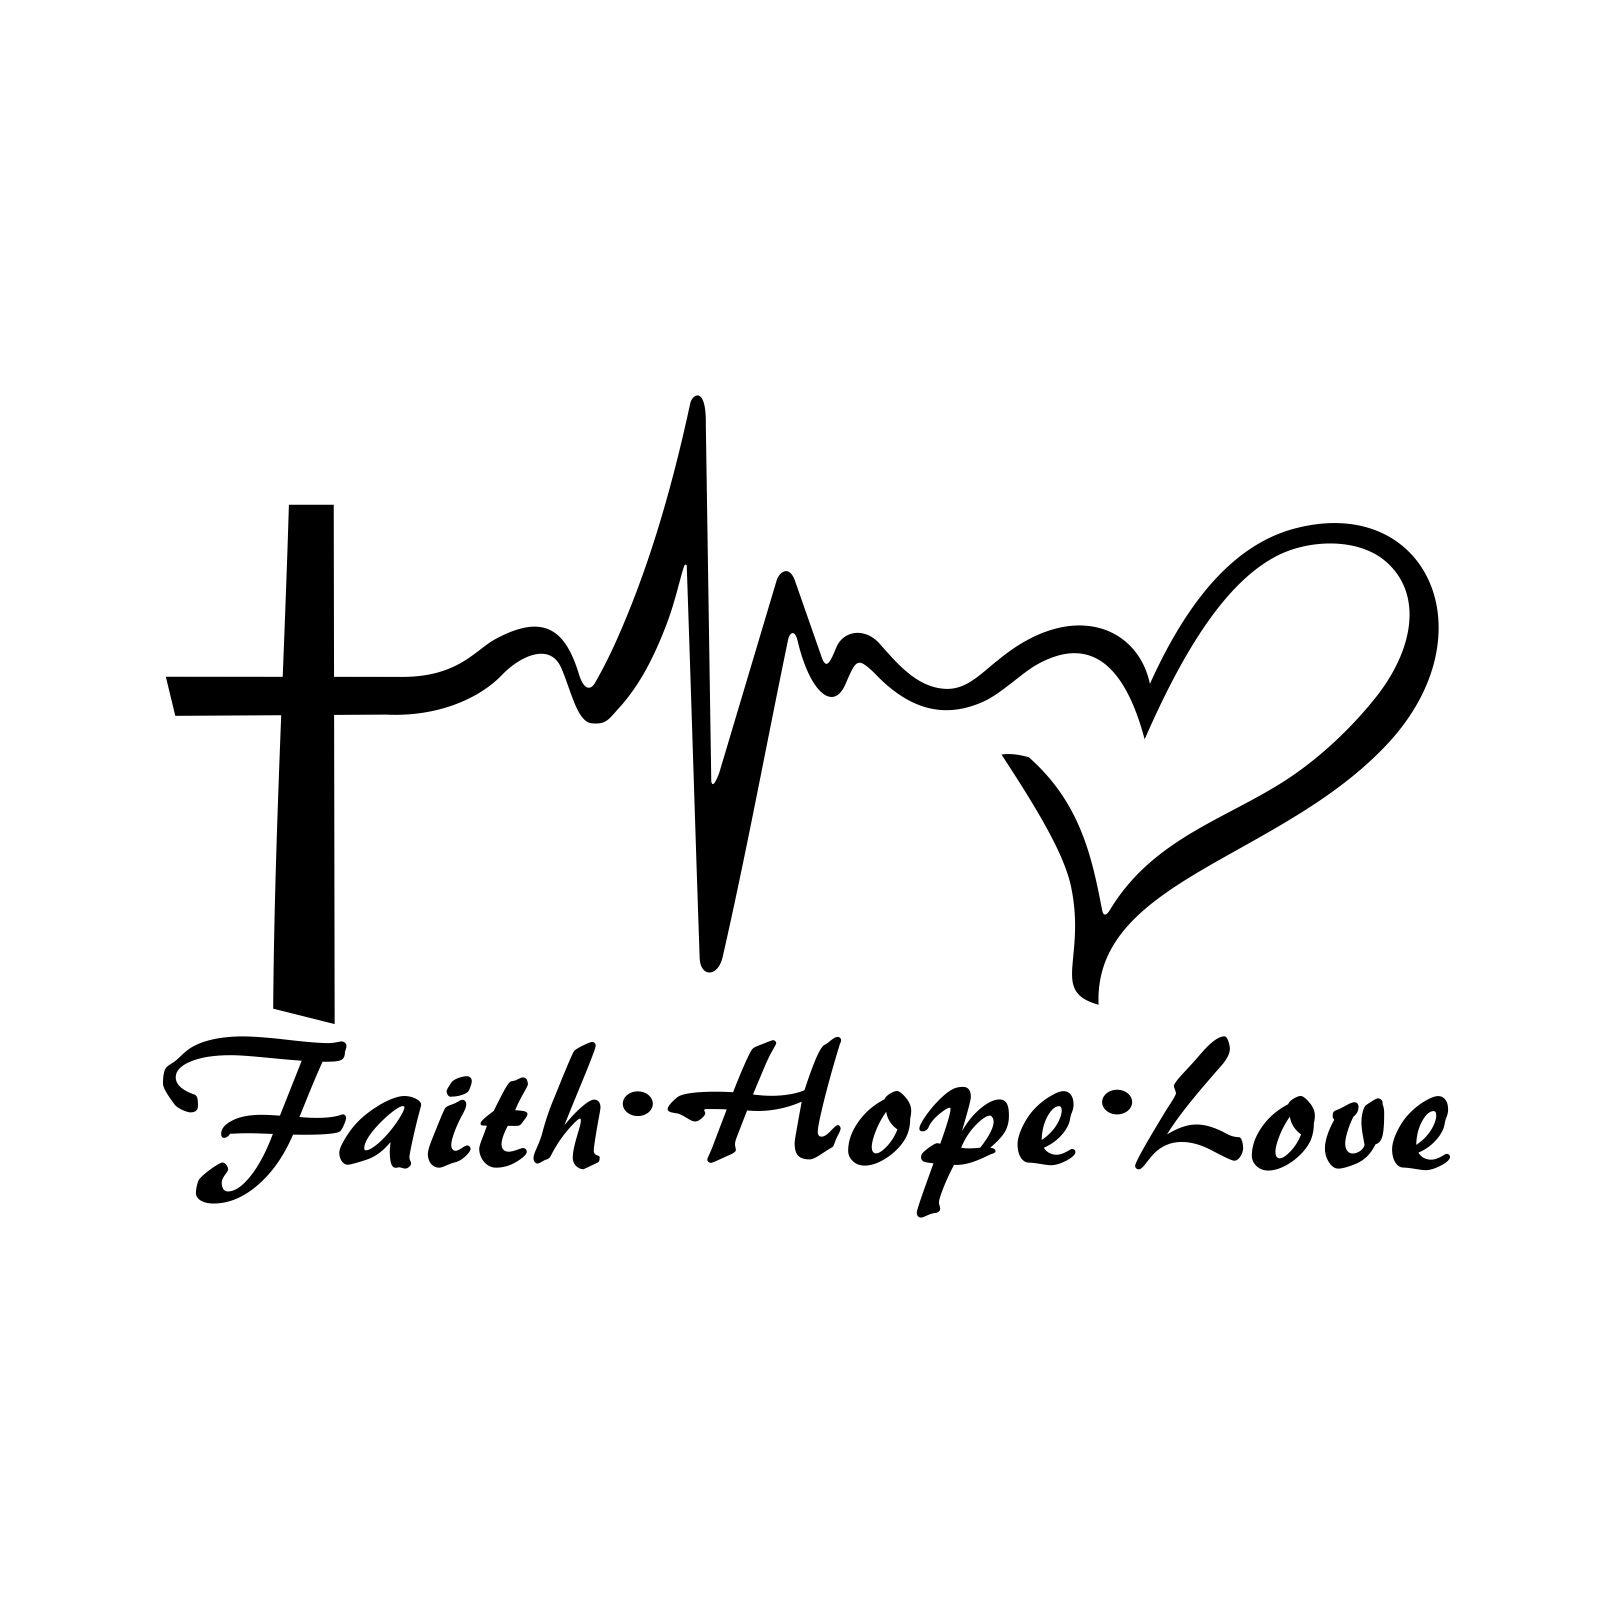 Faith Hope Love Heart graphics design SVG DXF PNG Vector Art Clipart.